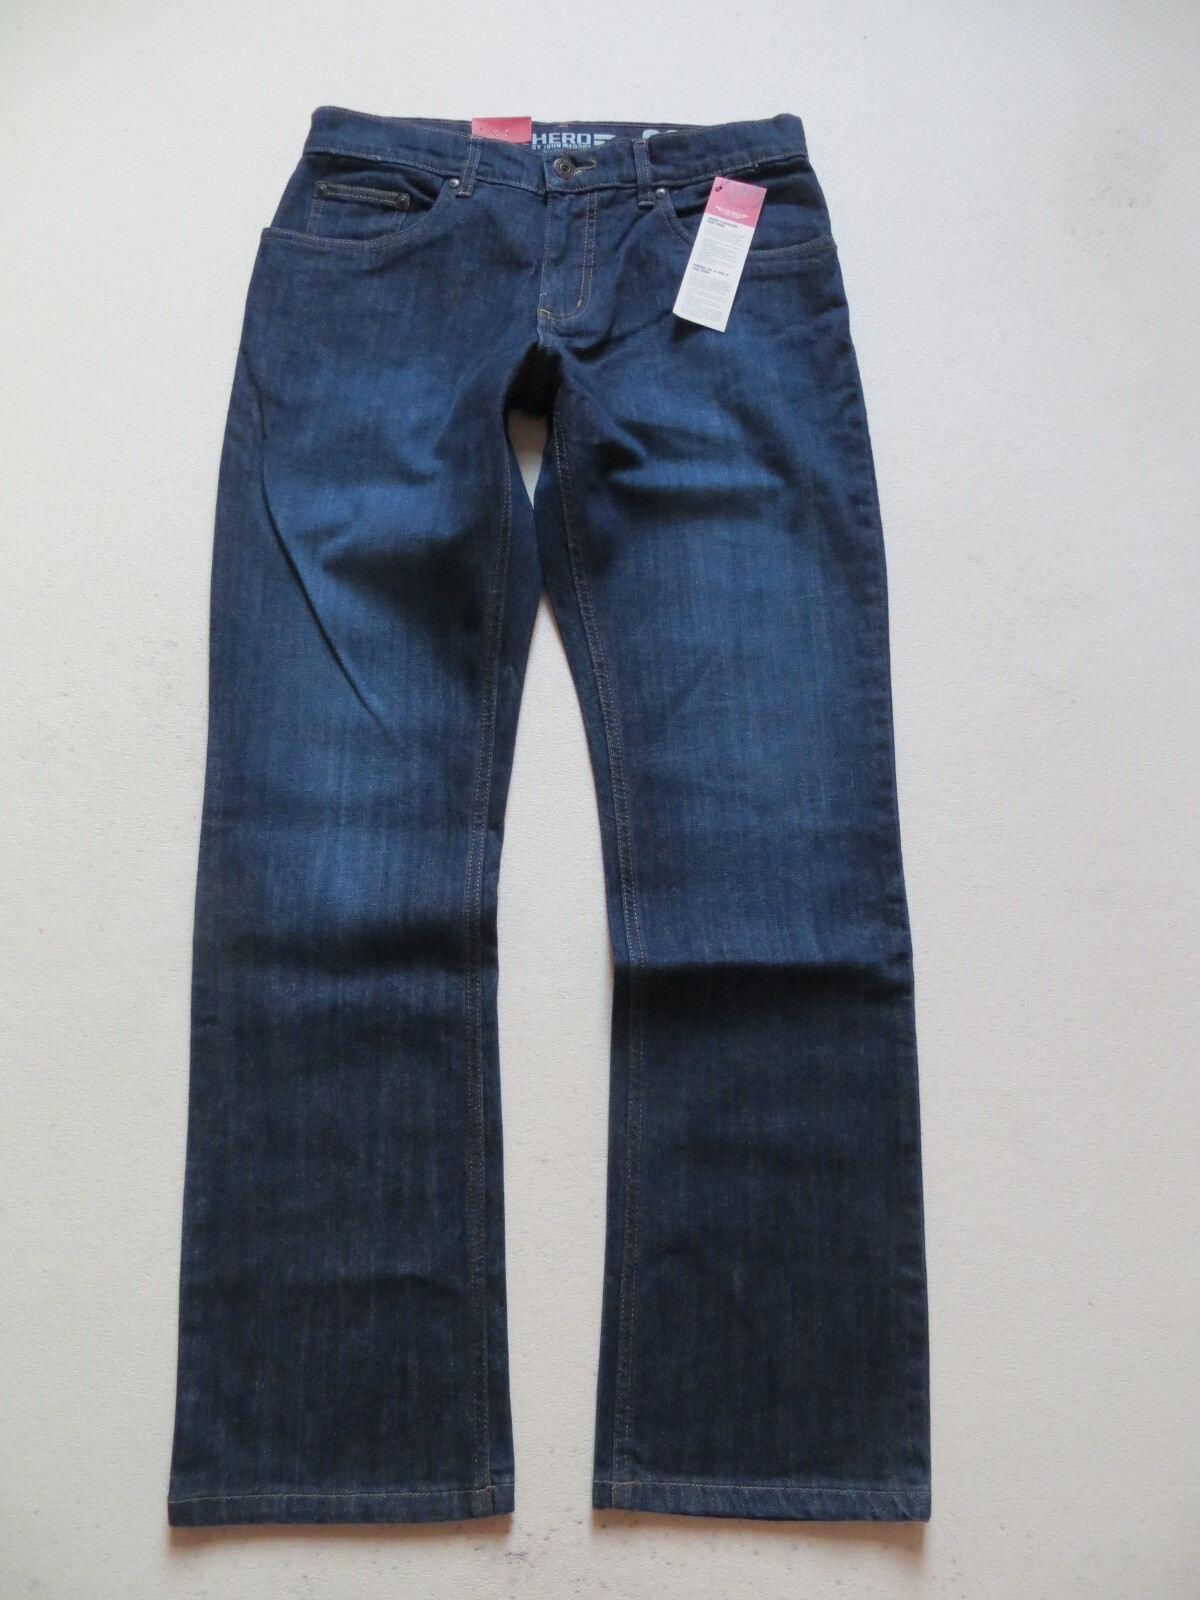 HERO by John Medoox BOSTON Stretch Jeans Hose W 33  L 32, DARK USED Denim, NEU